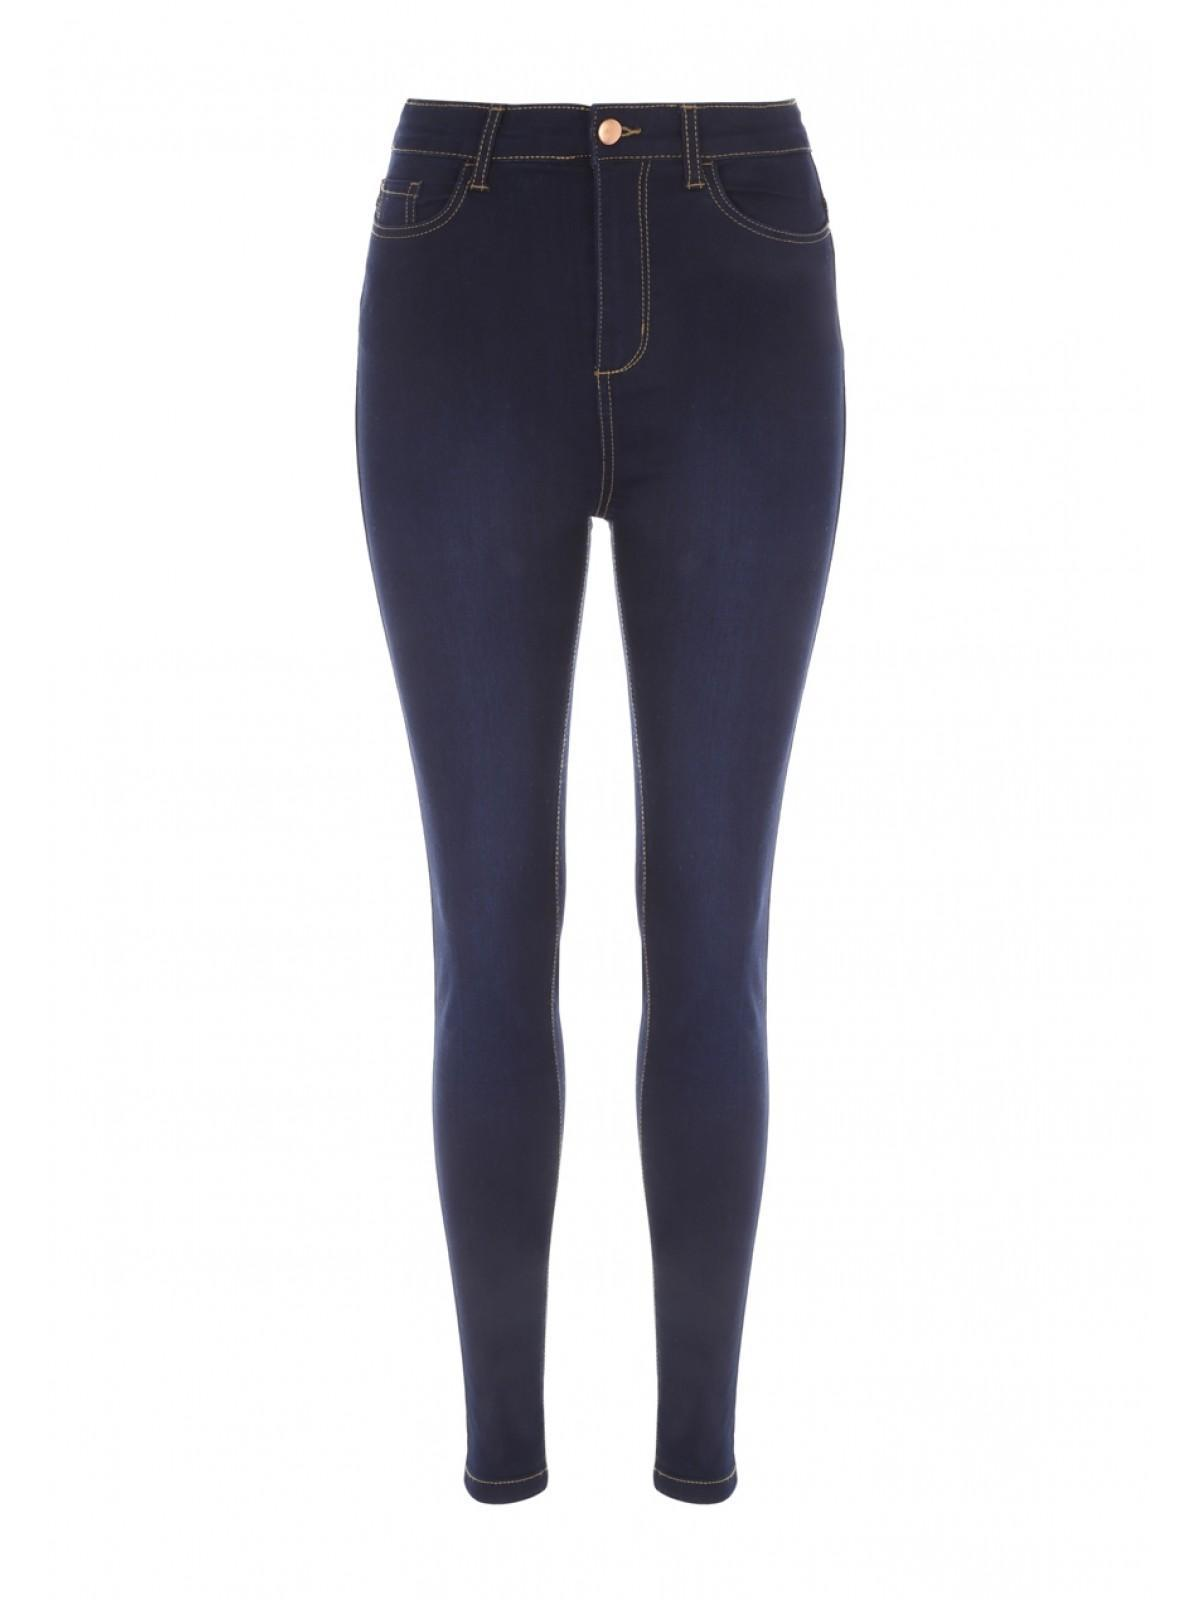 544011d72be59 Home; Womens Dark Blue Rita Super Skinny Jeans. Back. PreviousNext